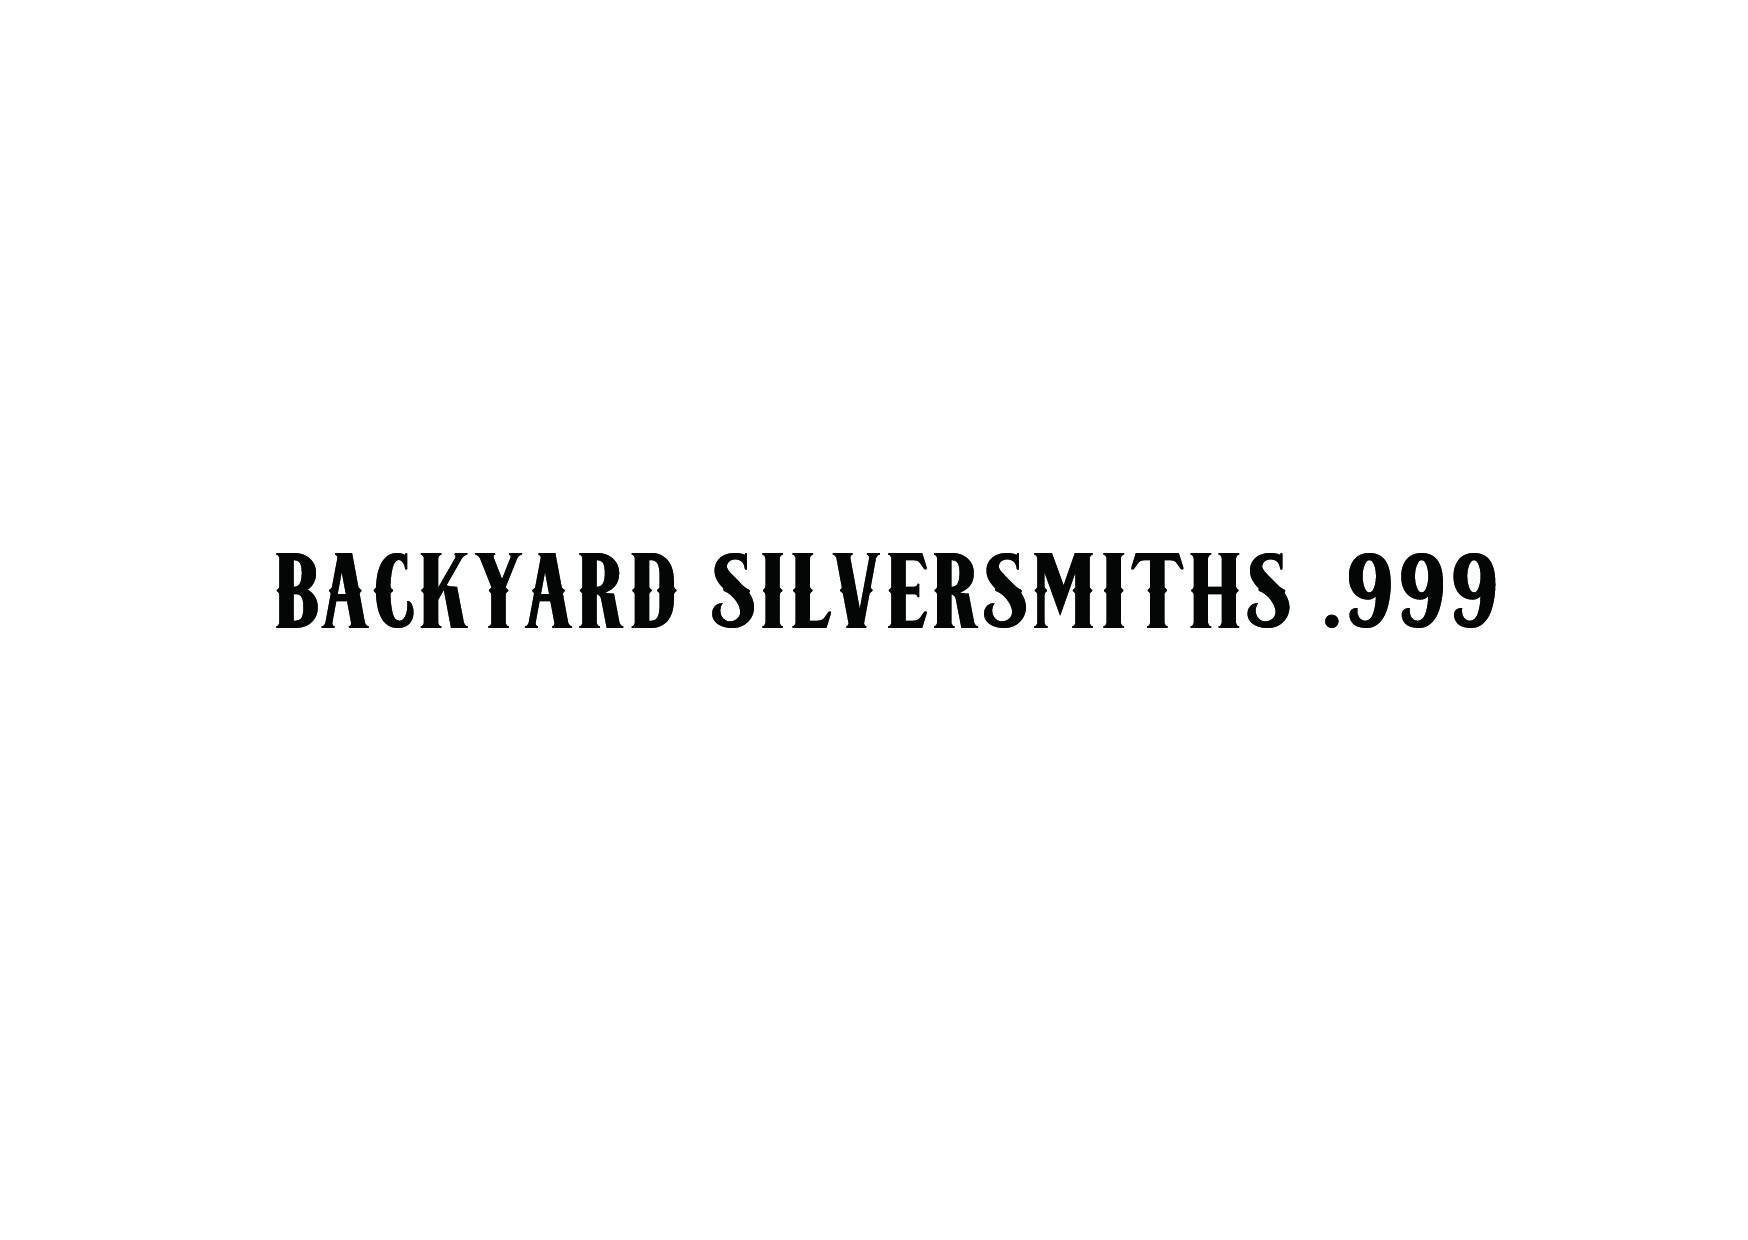 Backyard Silversmiths Straight Line Text